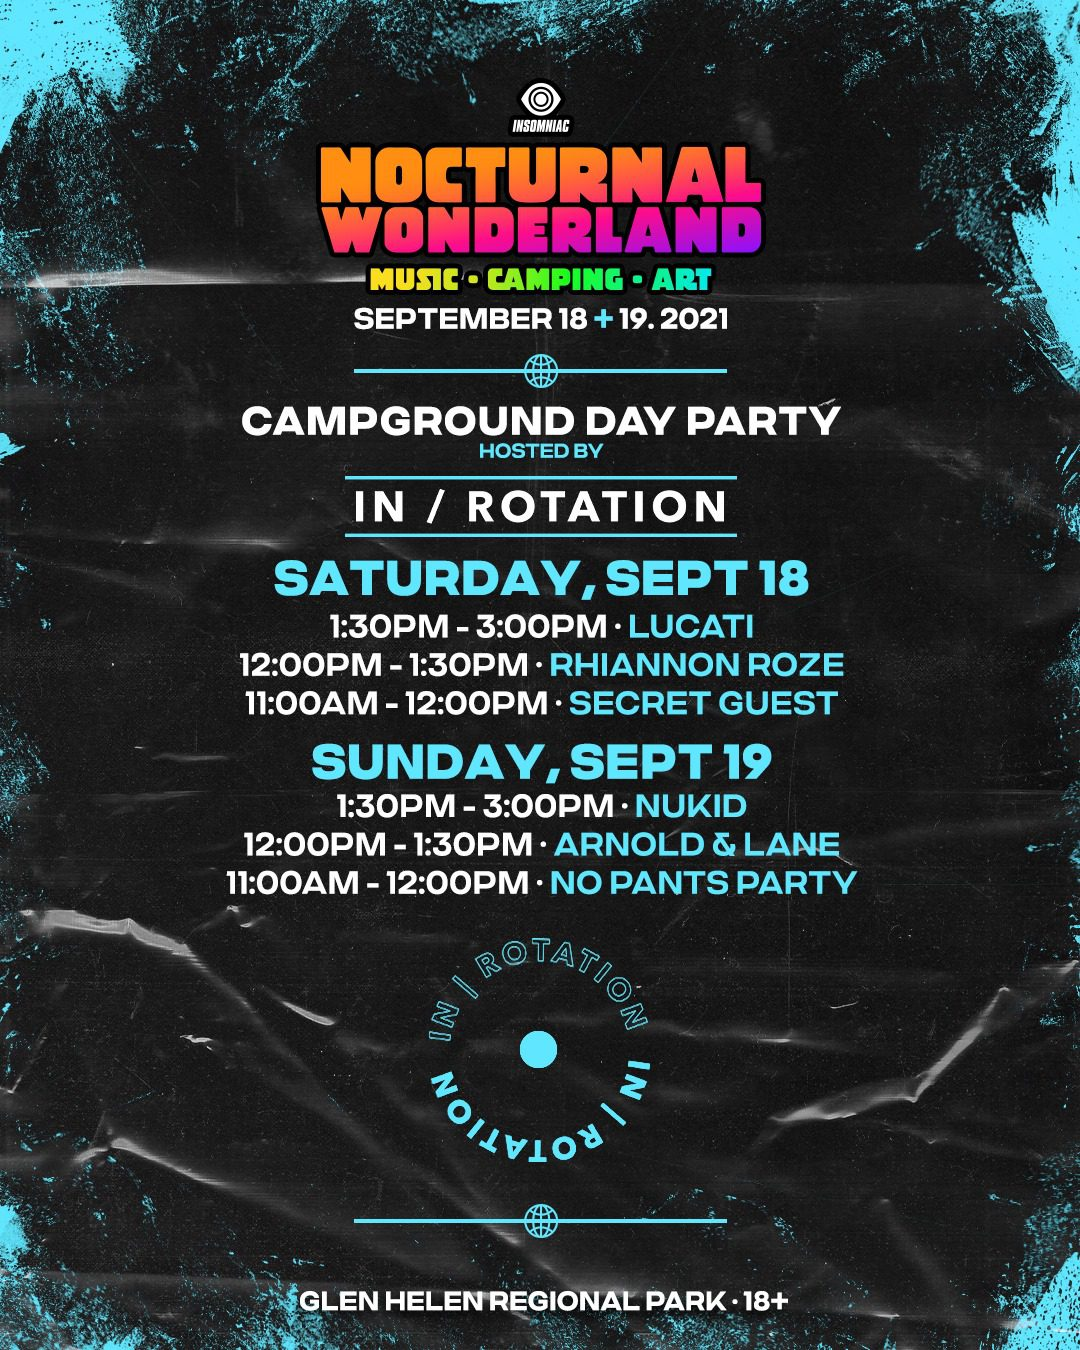 Nocturnal Wonderland Campground Day Party